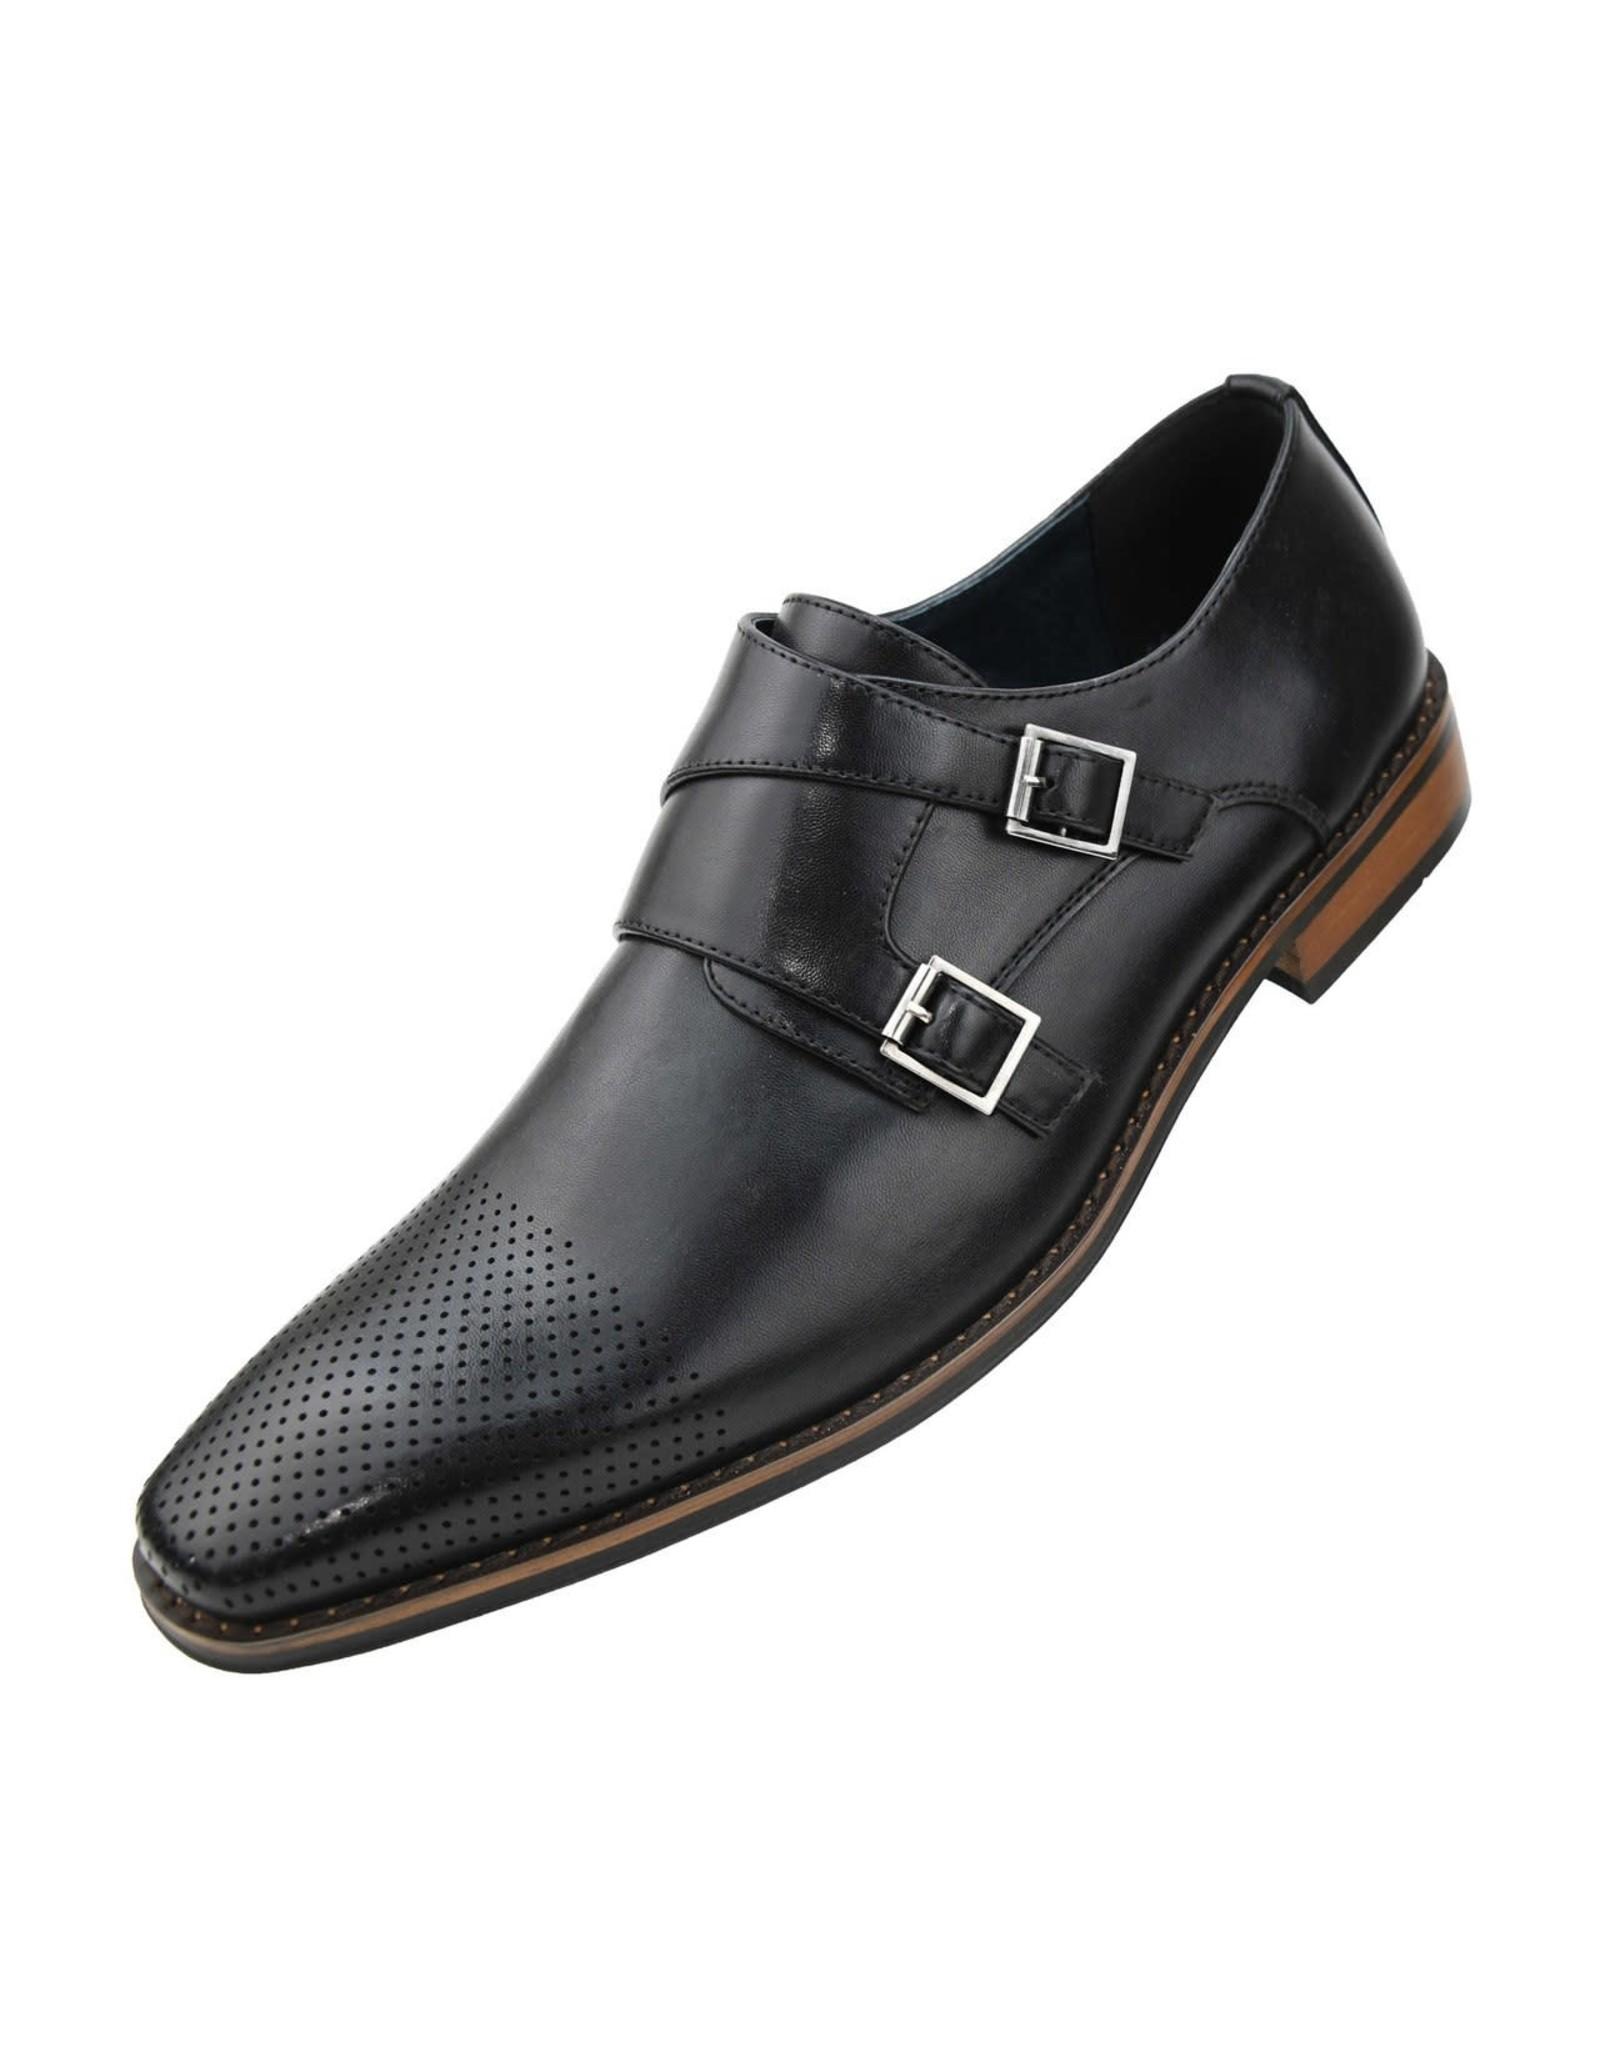 Amali Amali Deming Dress Shoe - Black